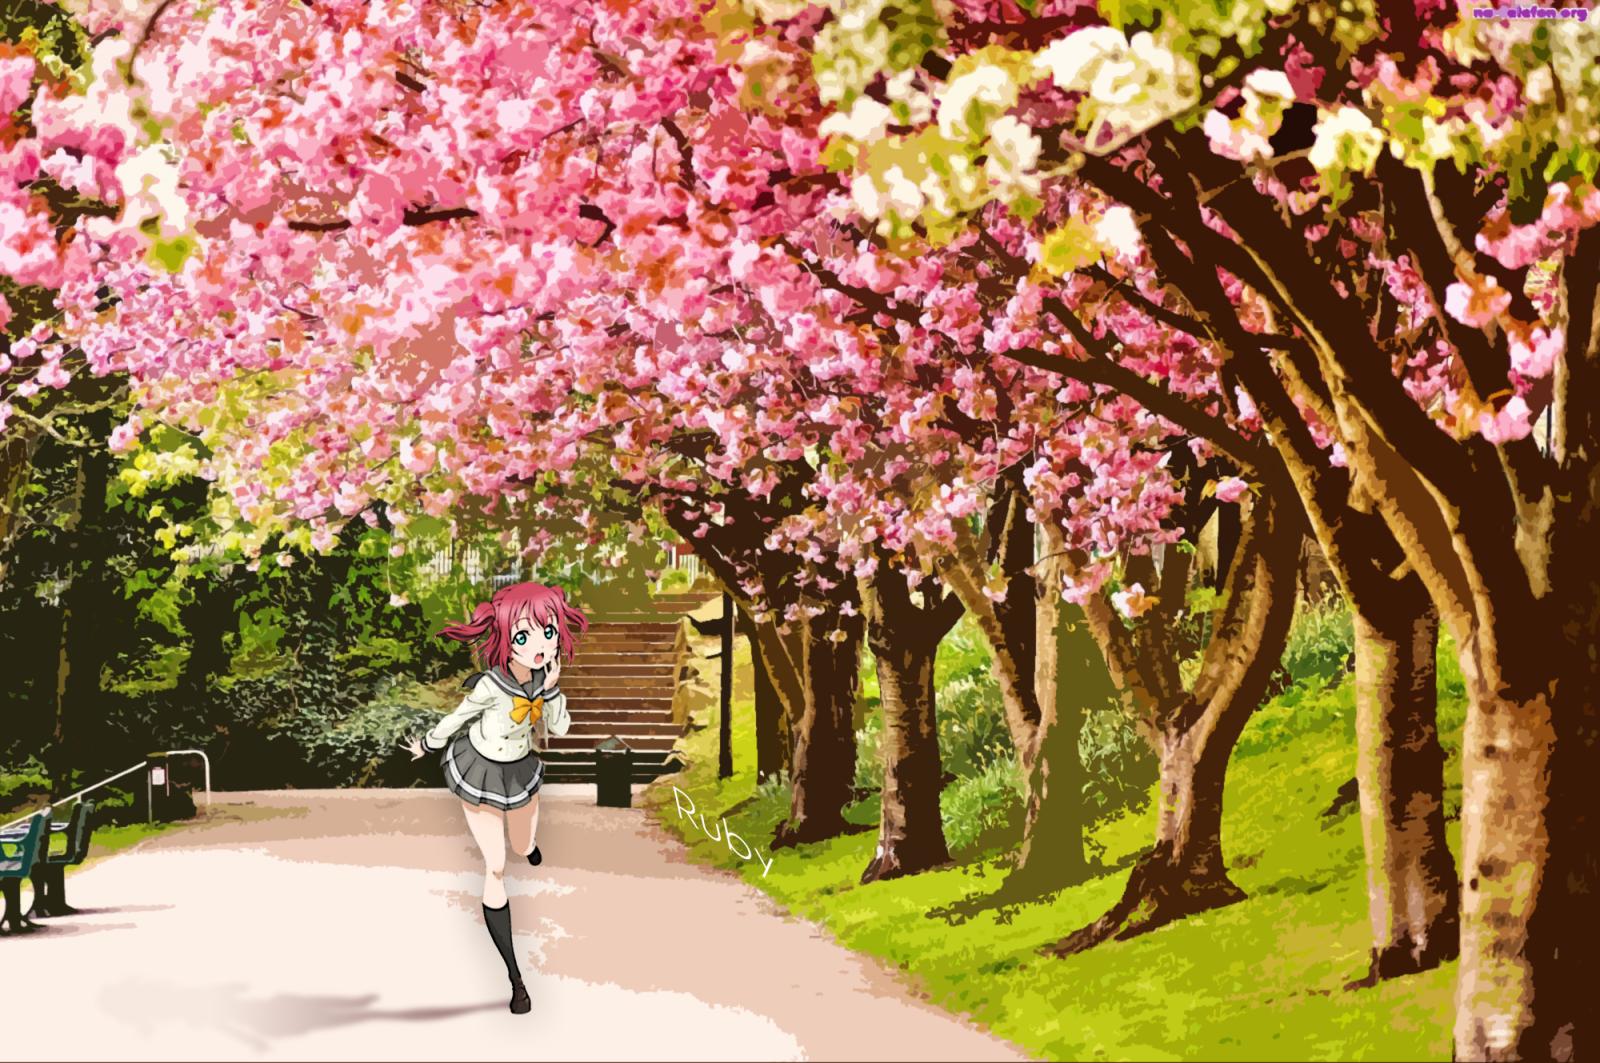 Wallpaper : Love Live, branch, cherry blossom, spring ...